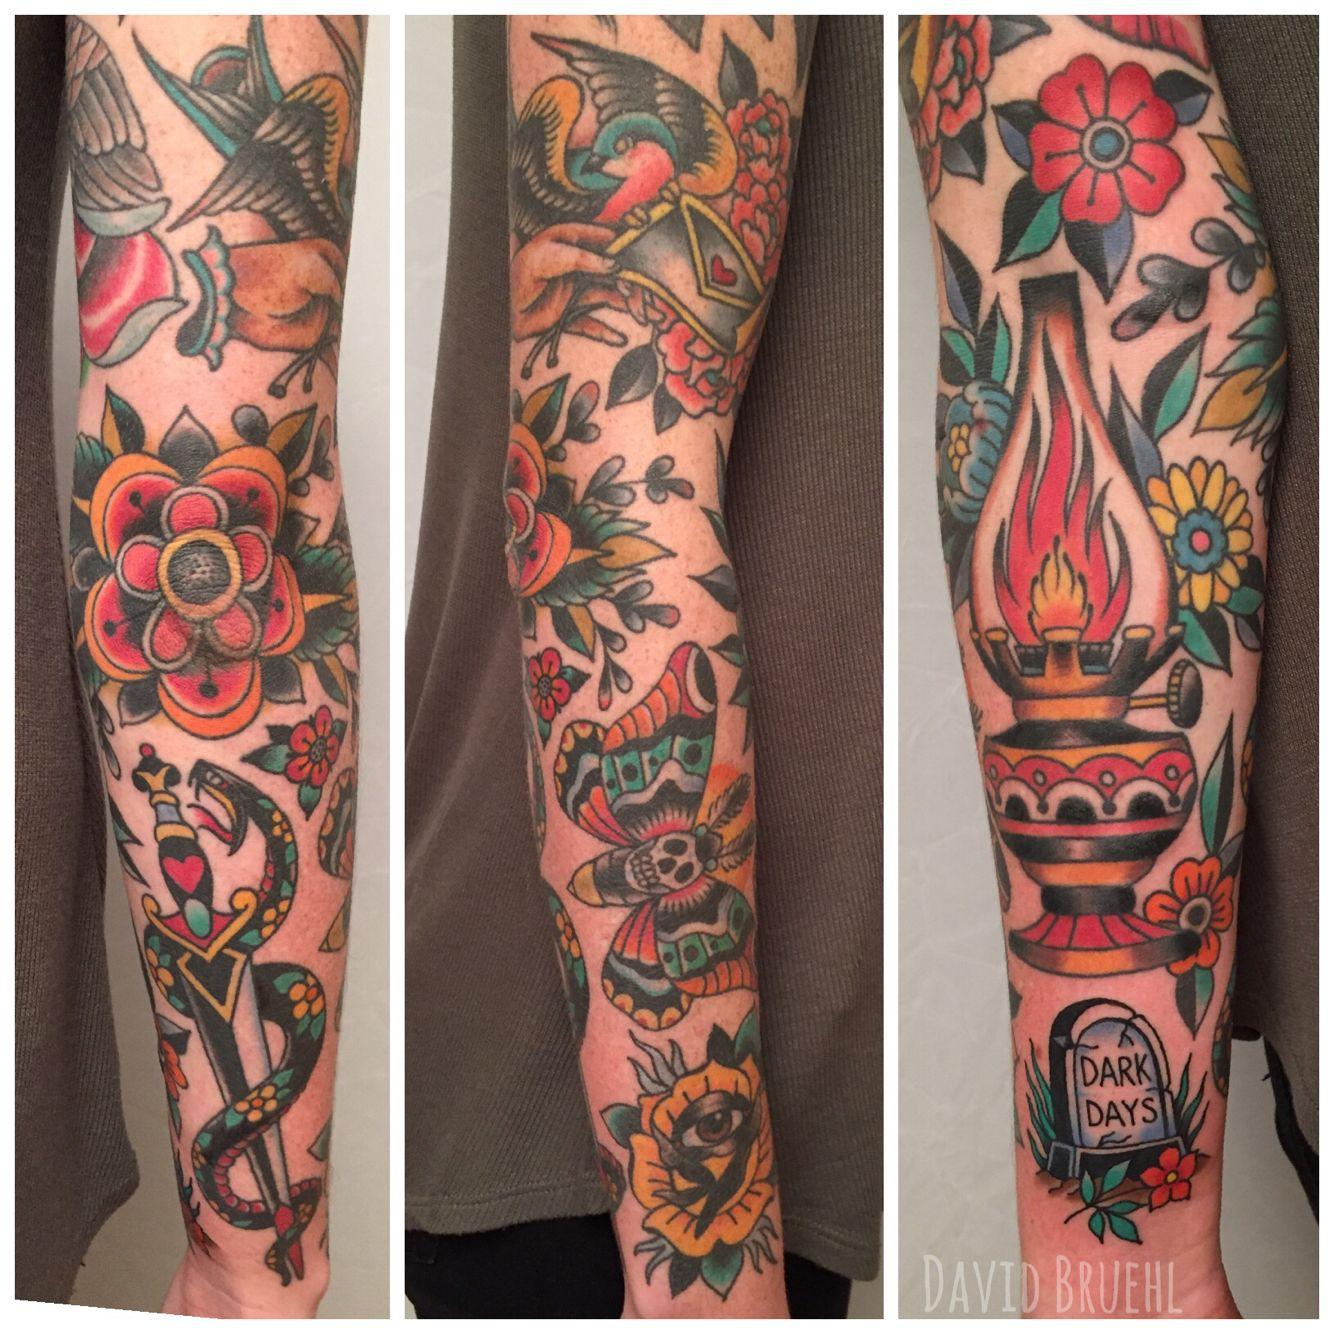 20 Color Sleeve Tattoos: Traditional Color Sleeve Tattoo. David Bruehl RedLetter1